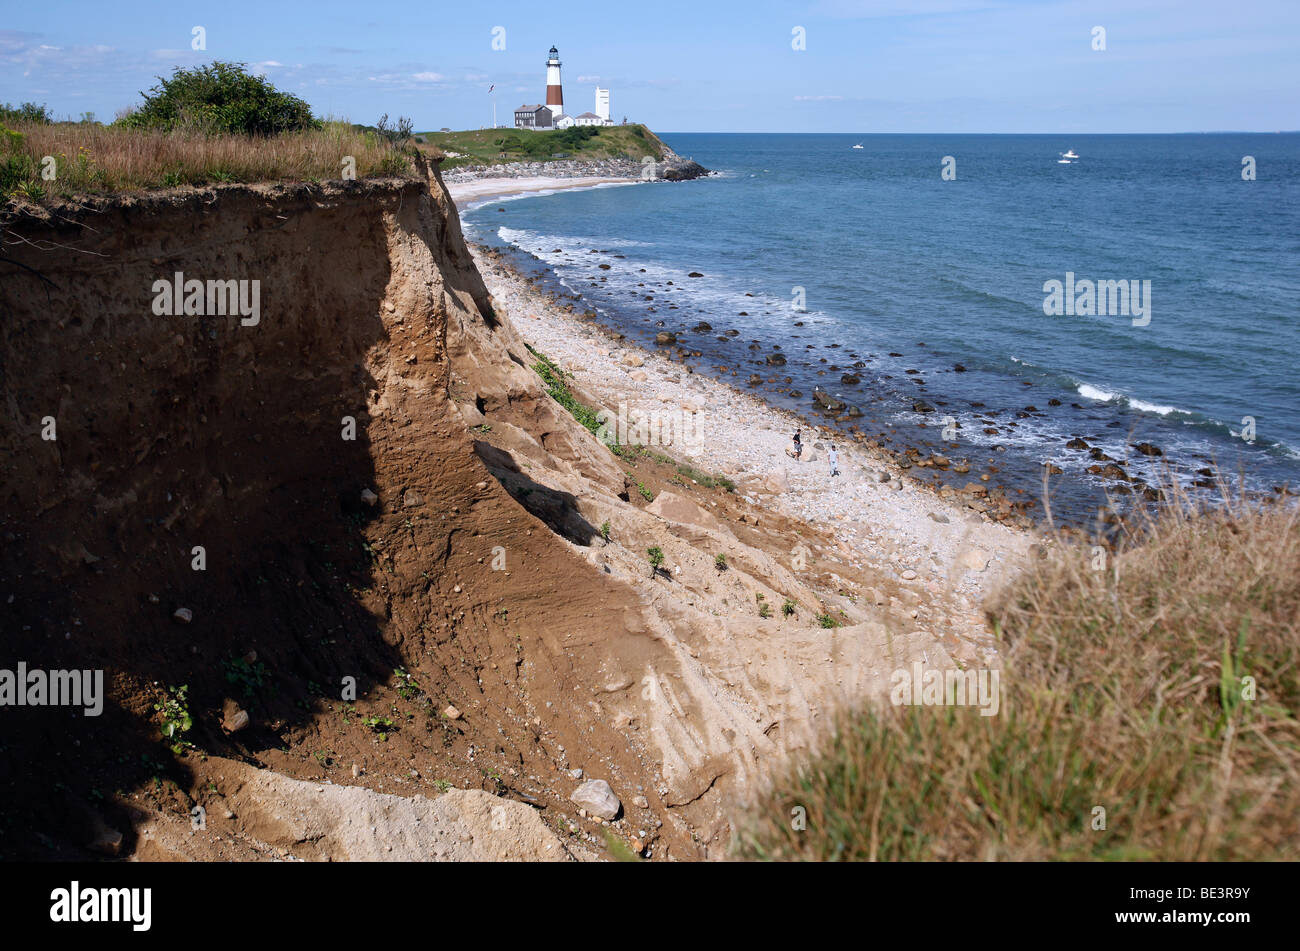 Ocean bluffs, Montauk lighthouse, Long Island, New York - Stock Image